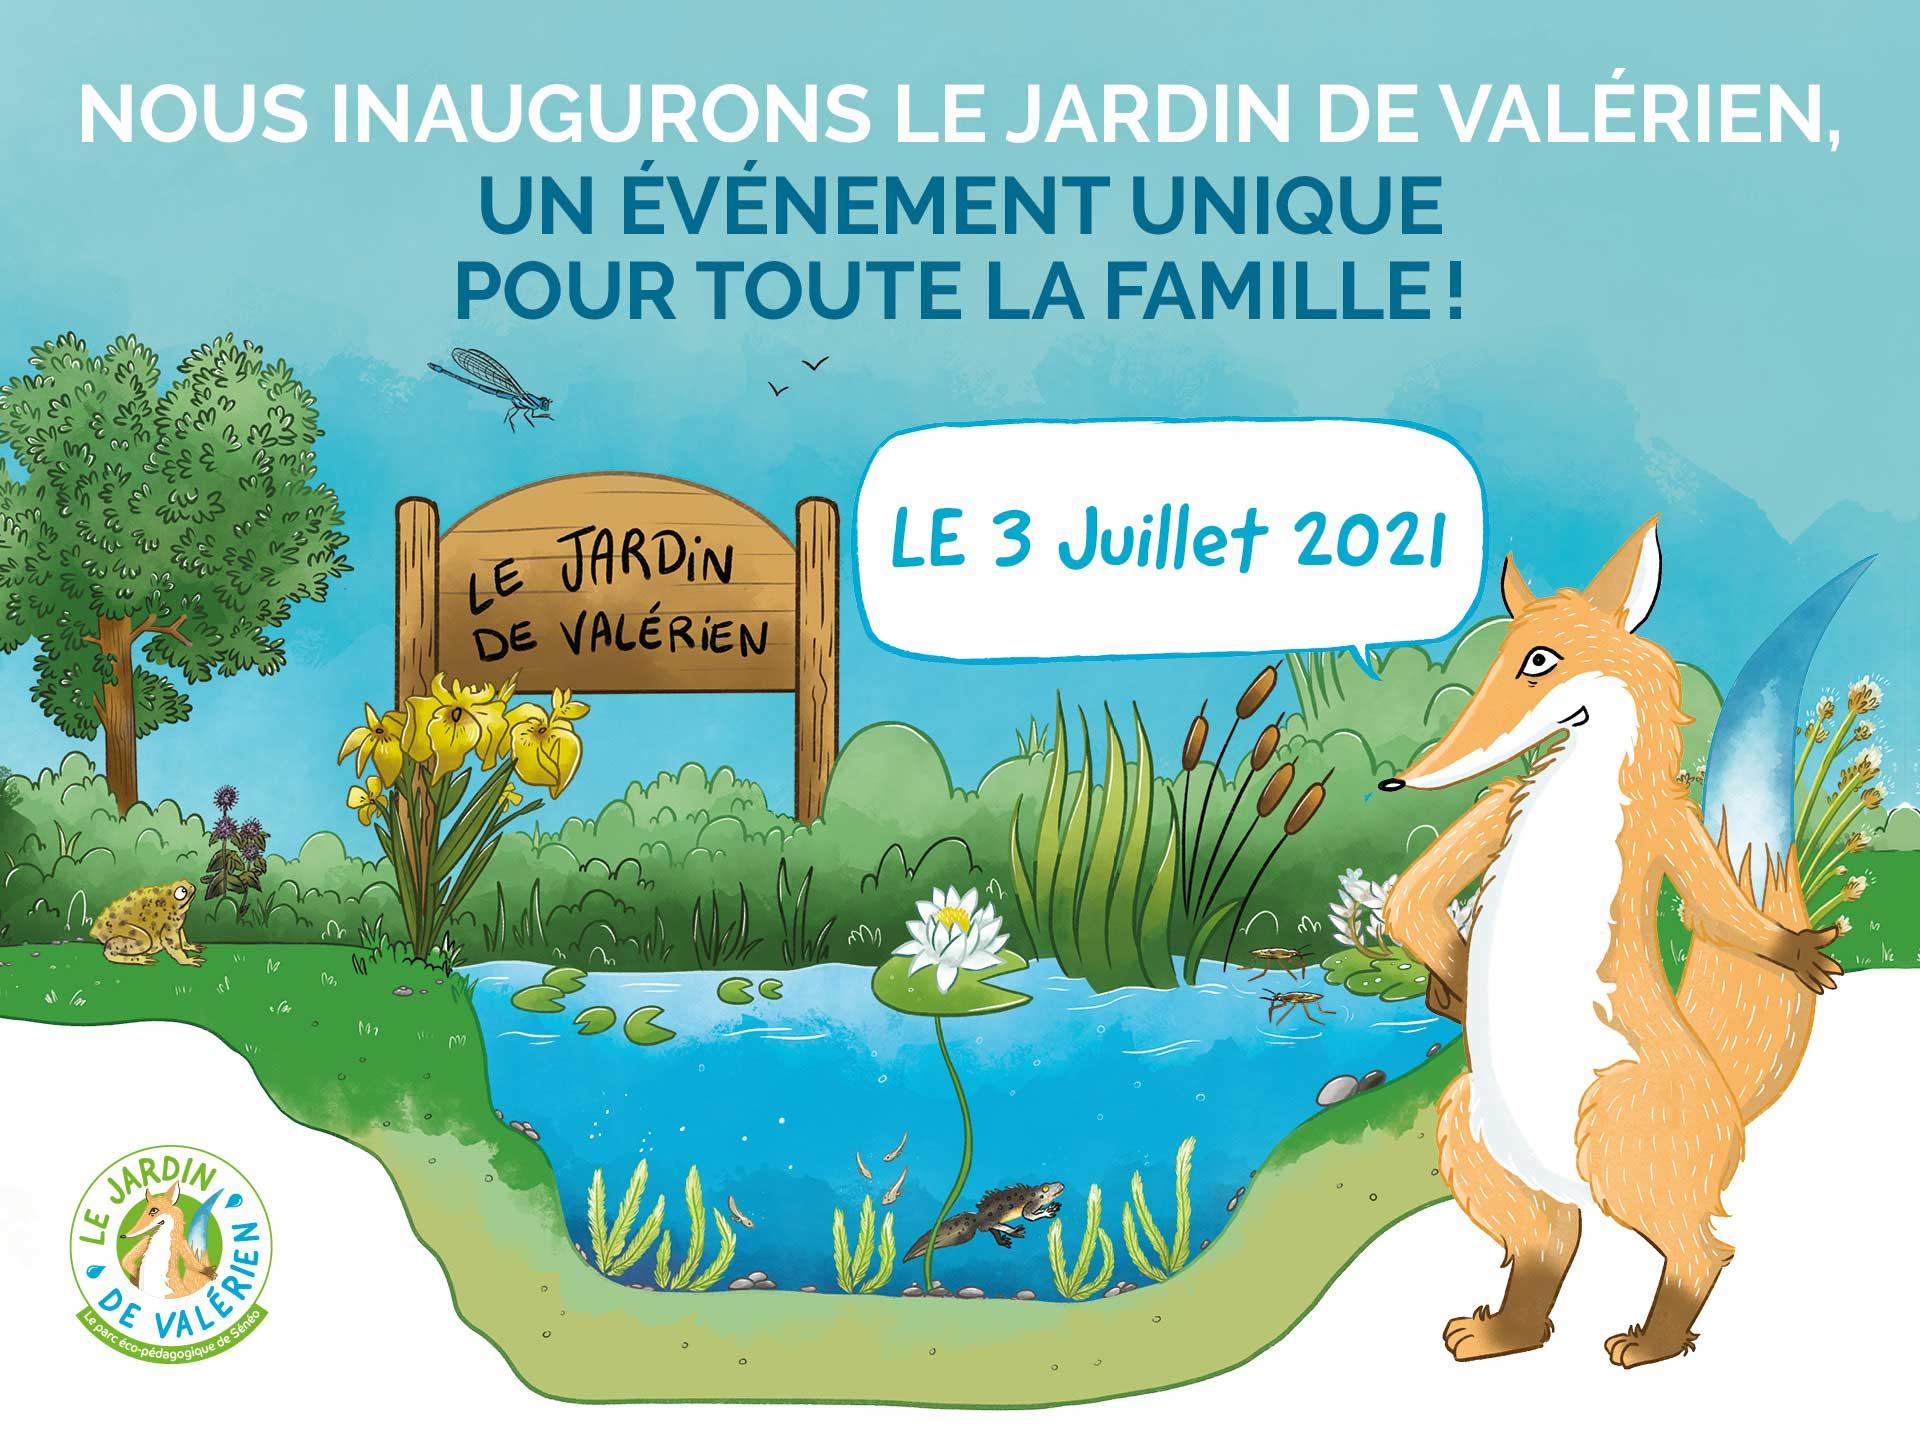 Inauguration du Jardin de Valérien